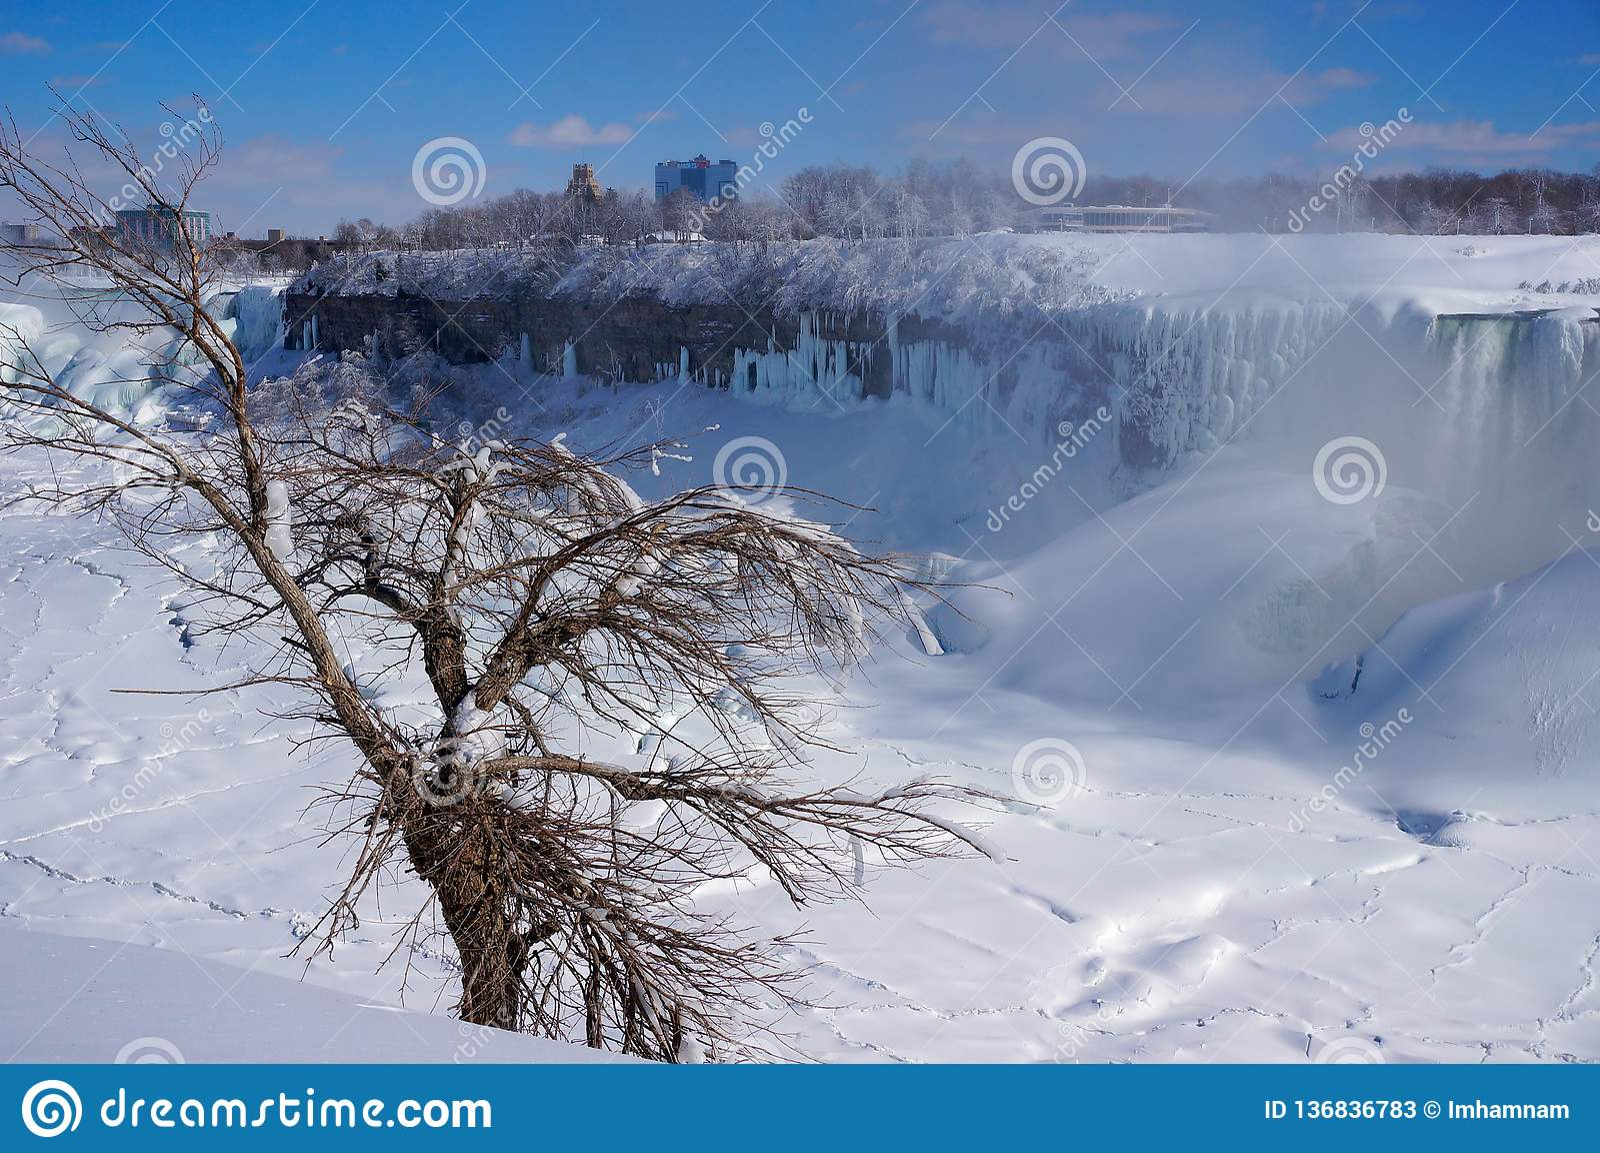 Chutes du Niagara blanches et arbres congelés en hiver